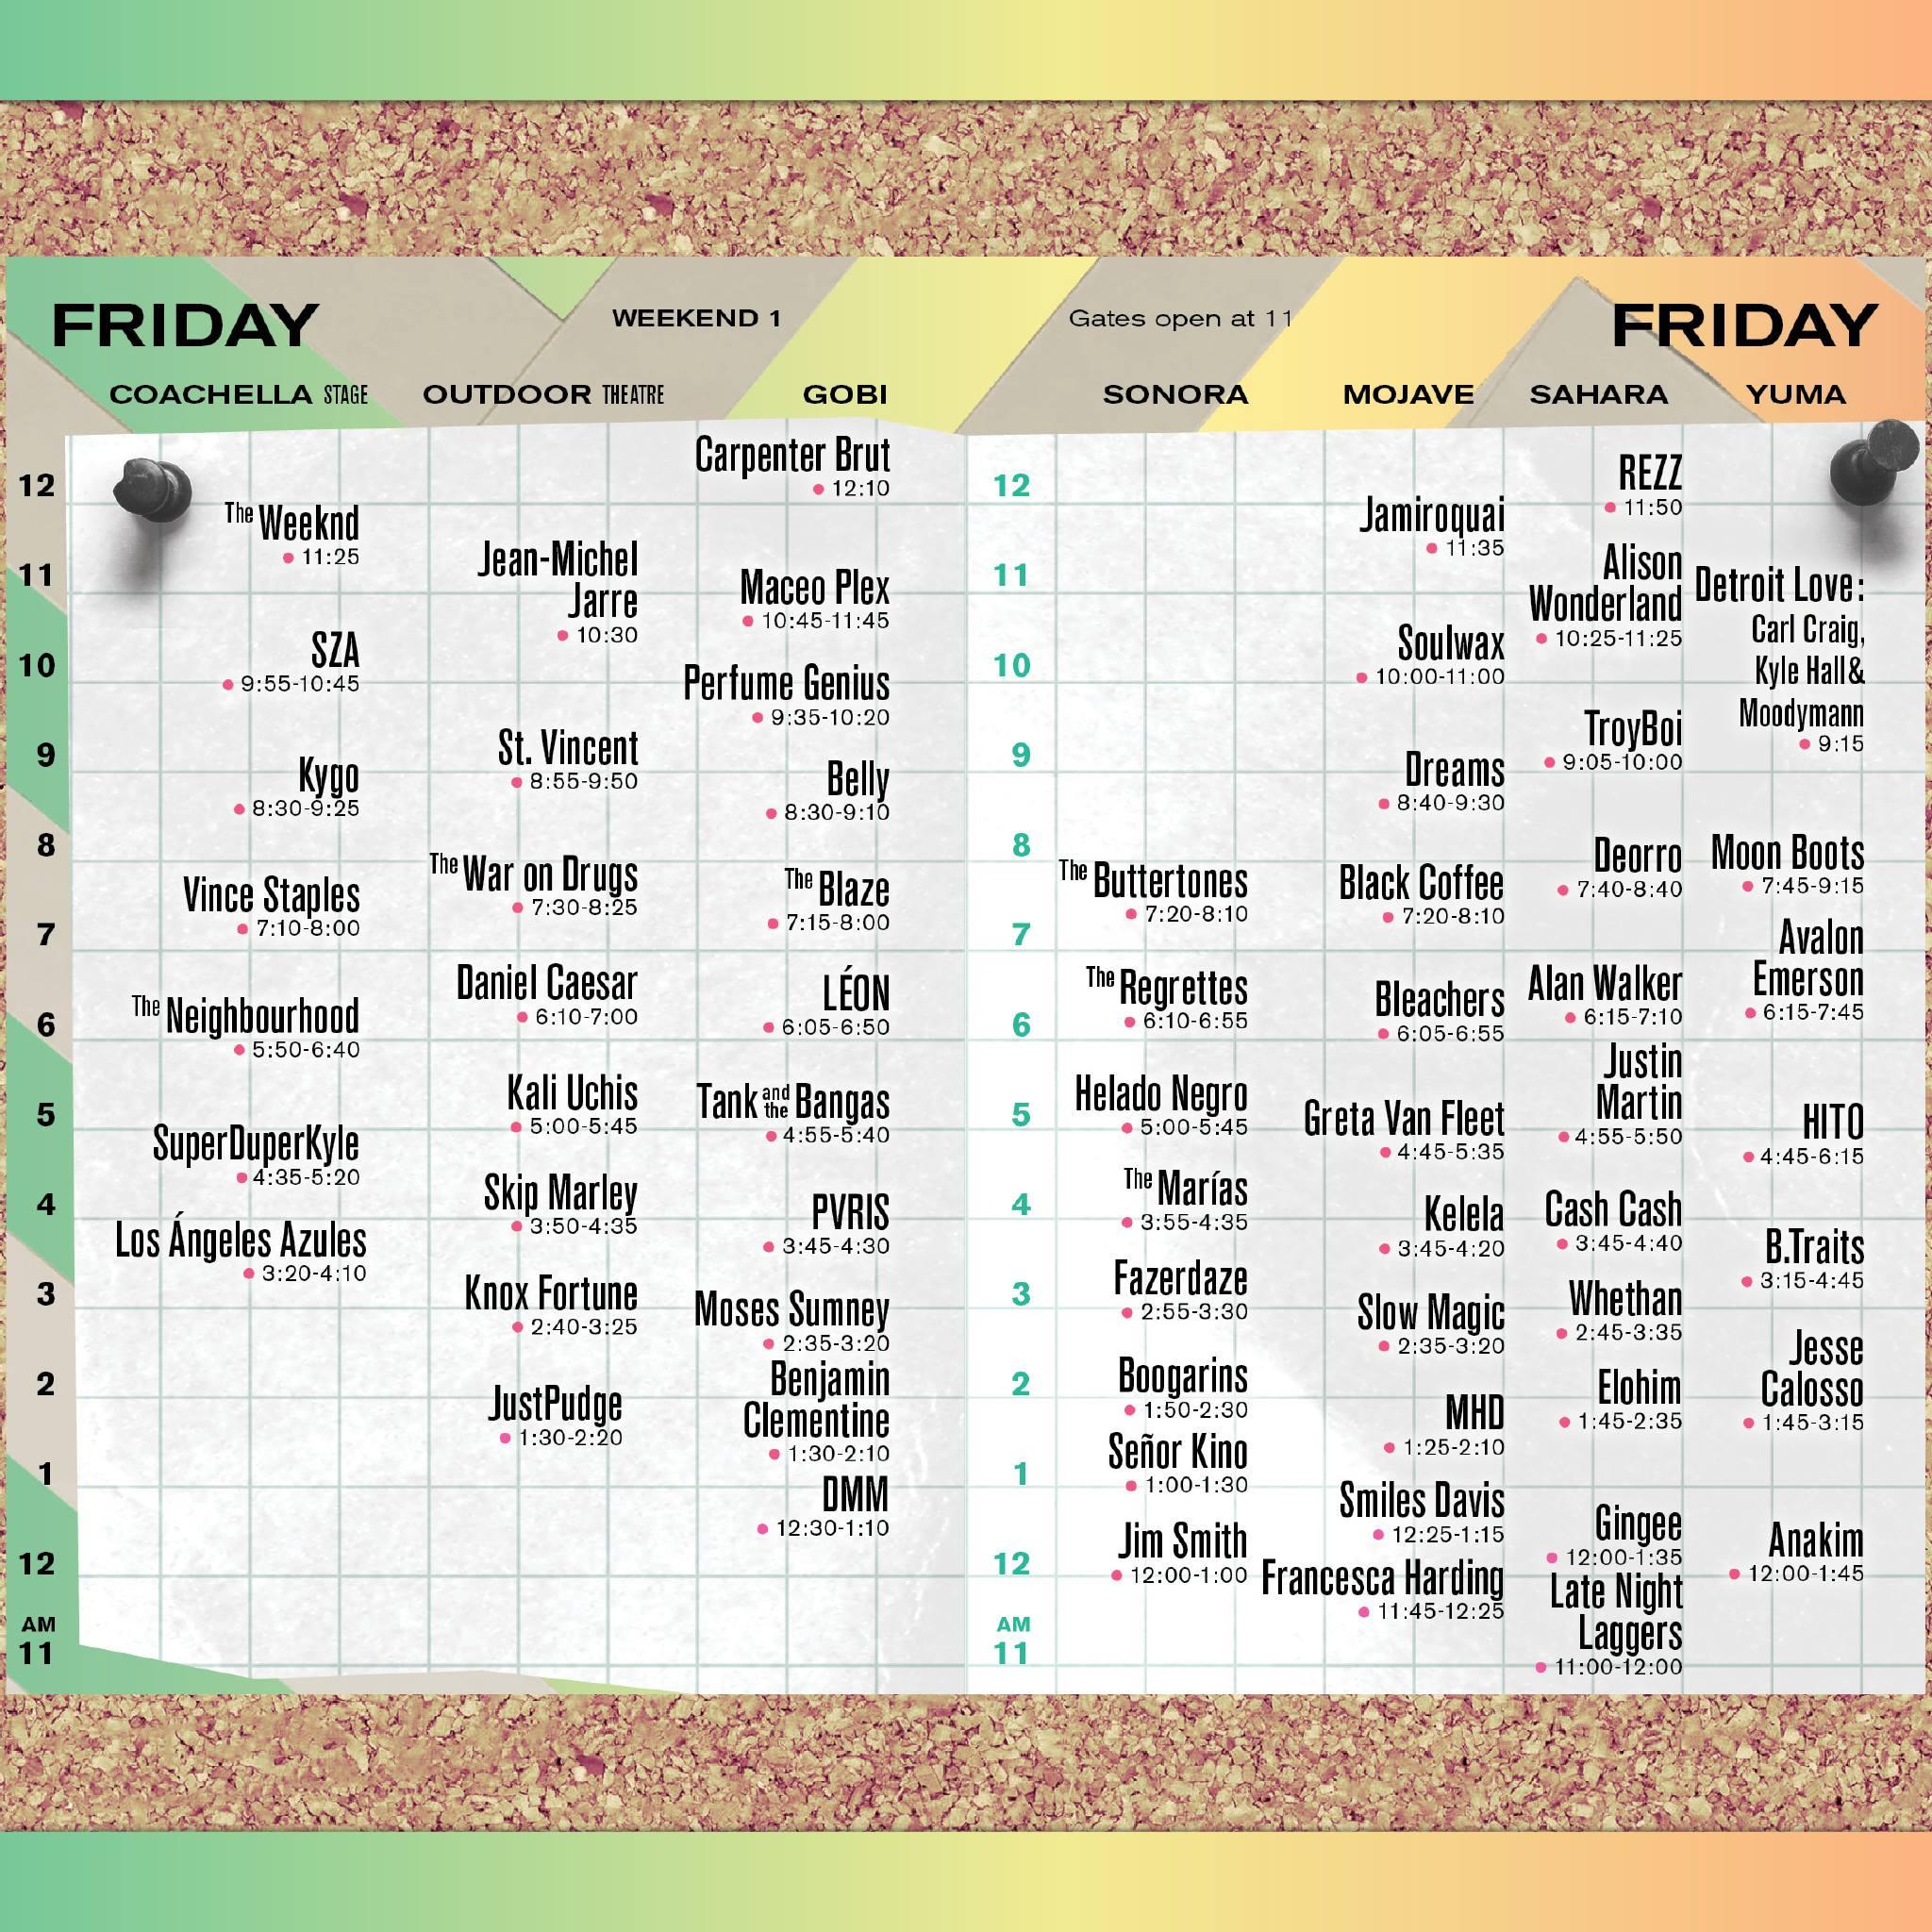 Coachella Friday 2018